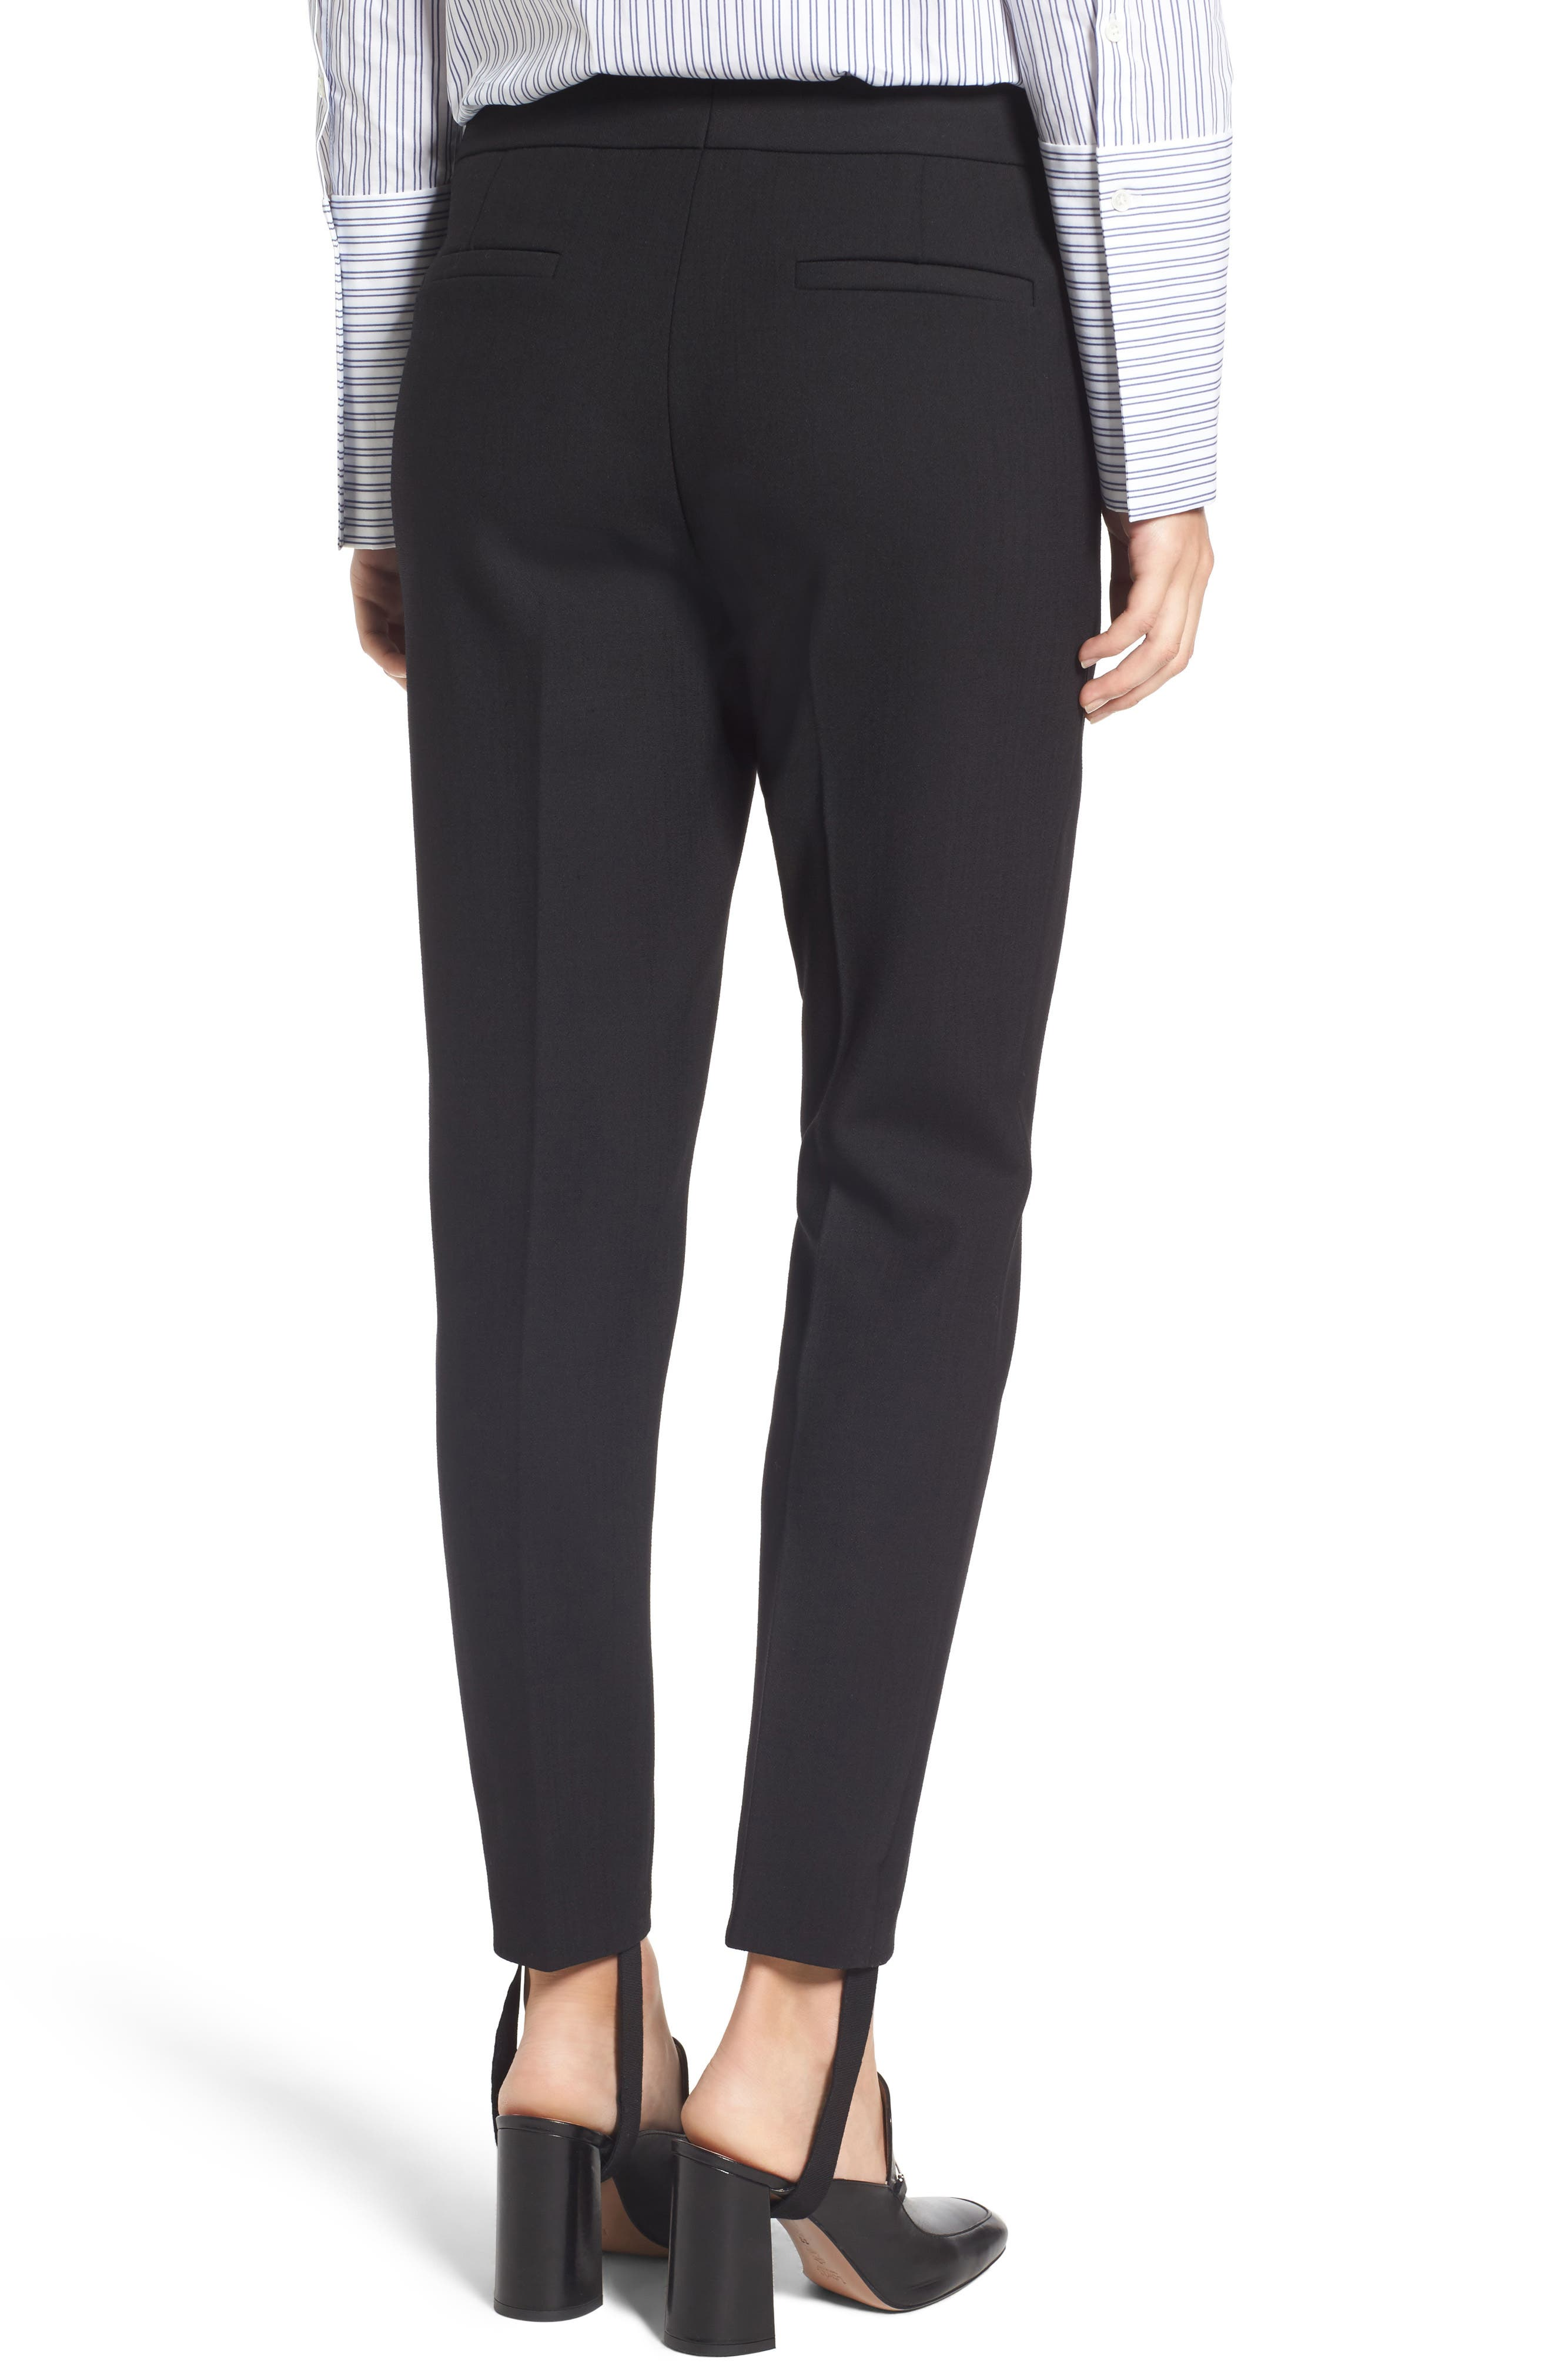 Removable Stirrup Pants,                             Alternate thumbnail 3, color,                             Black